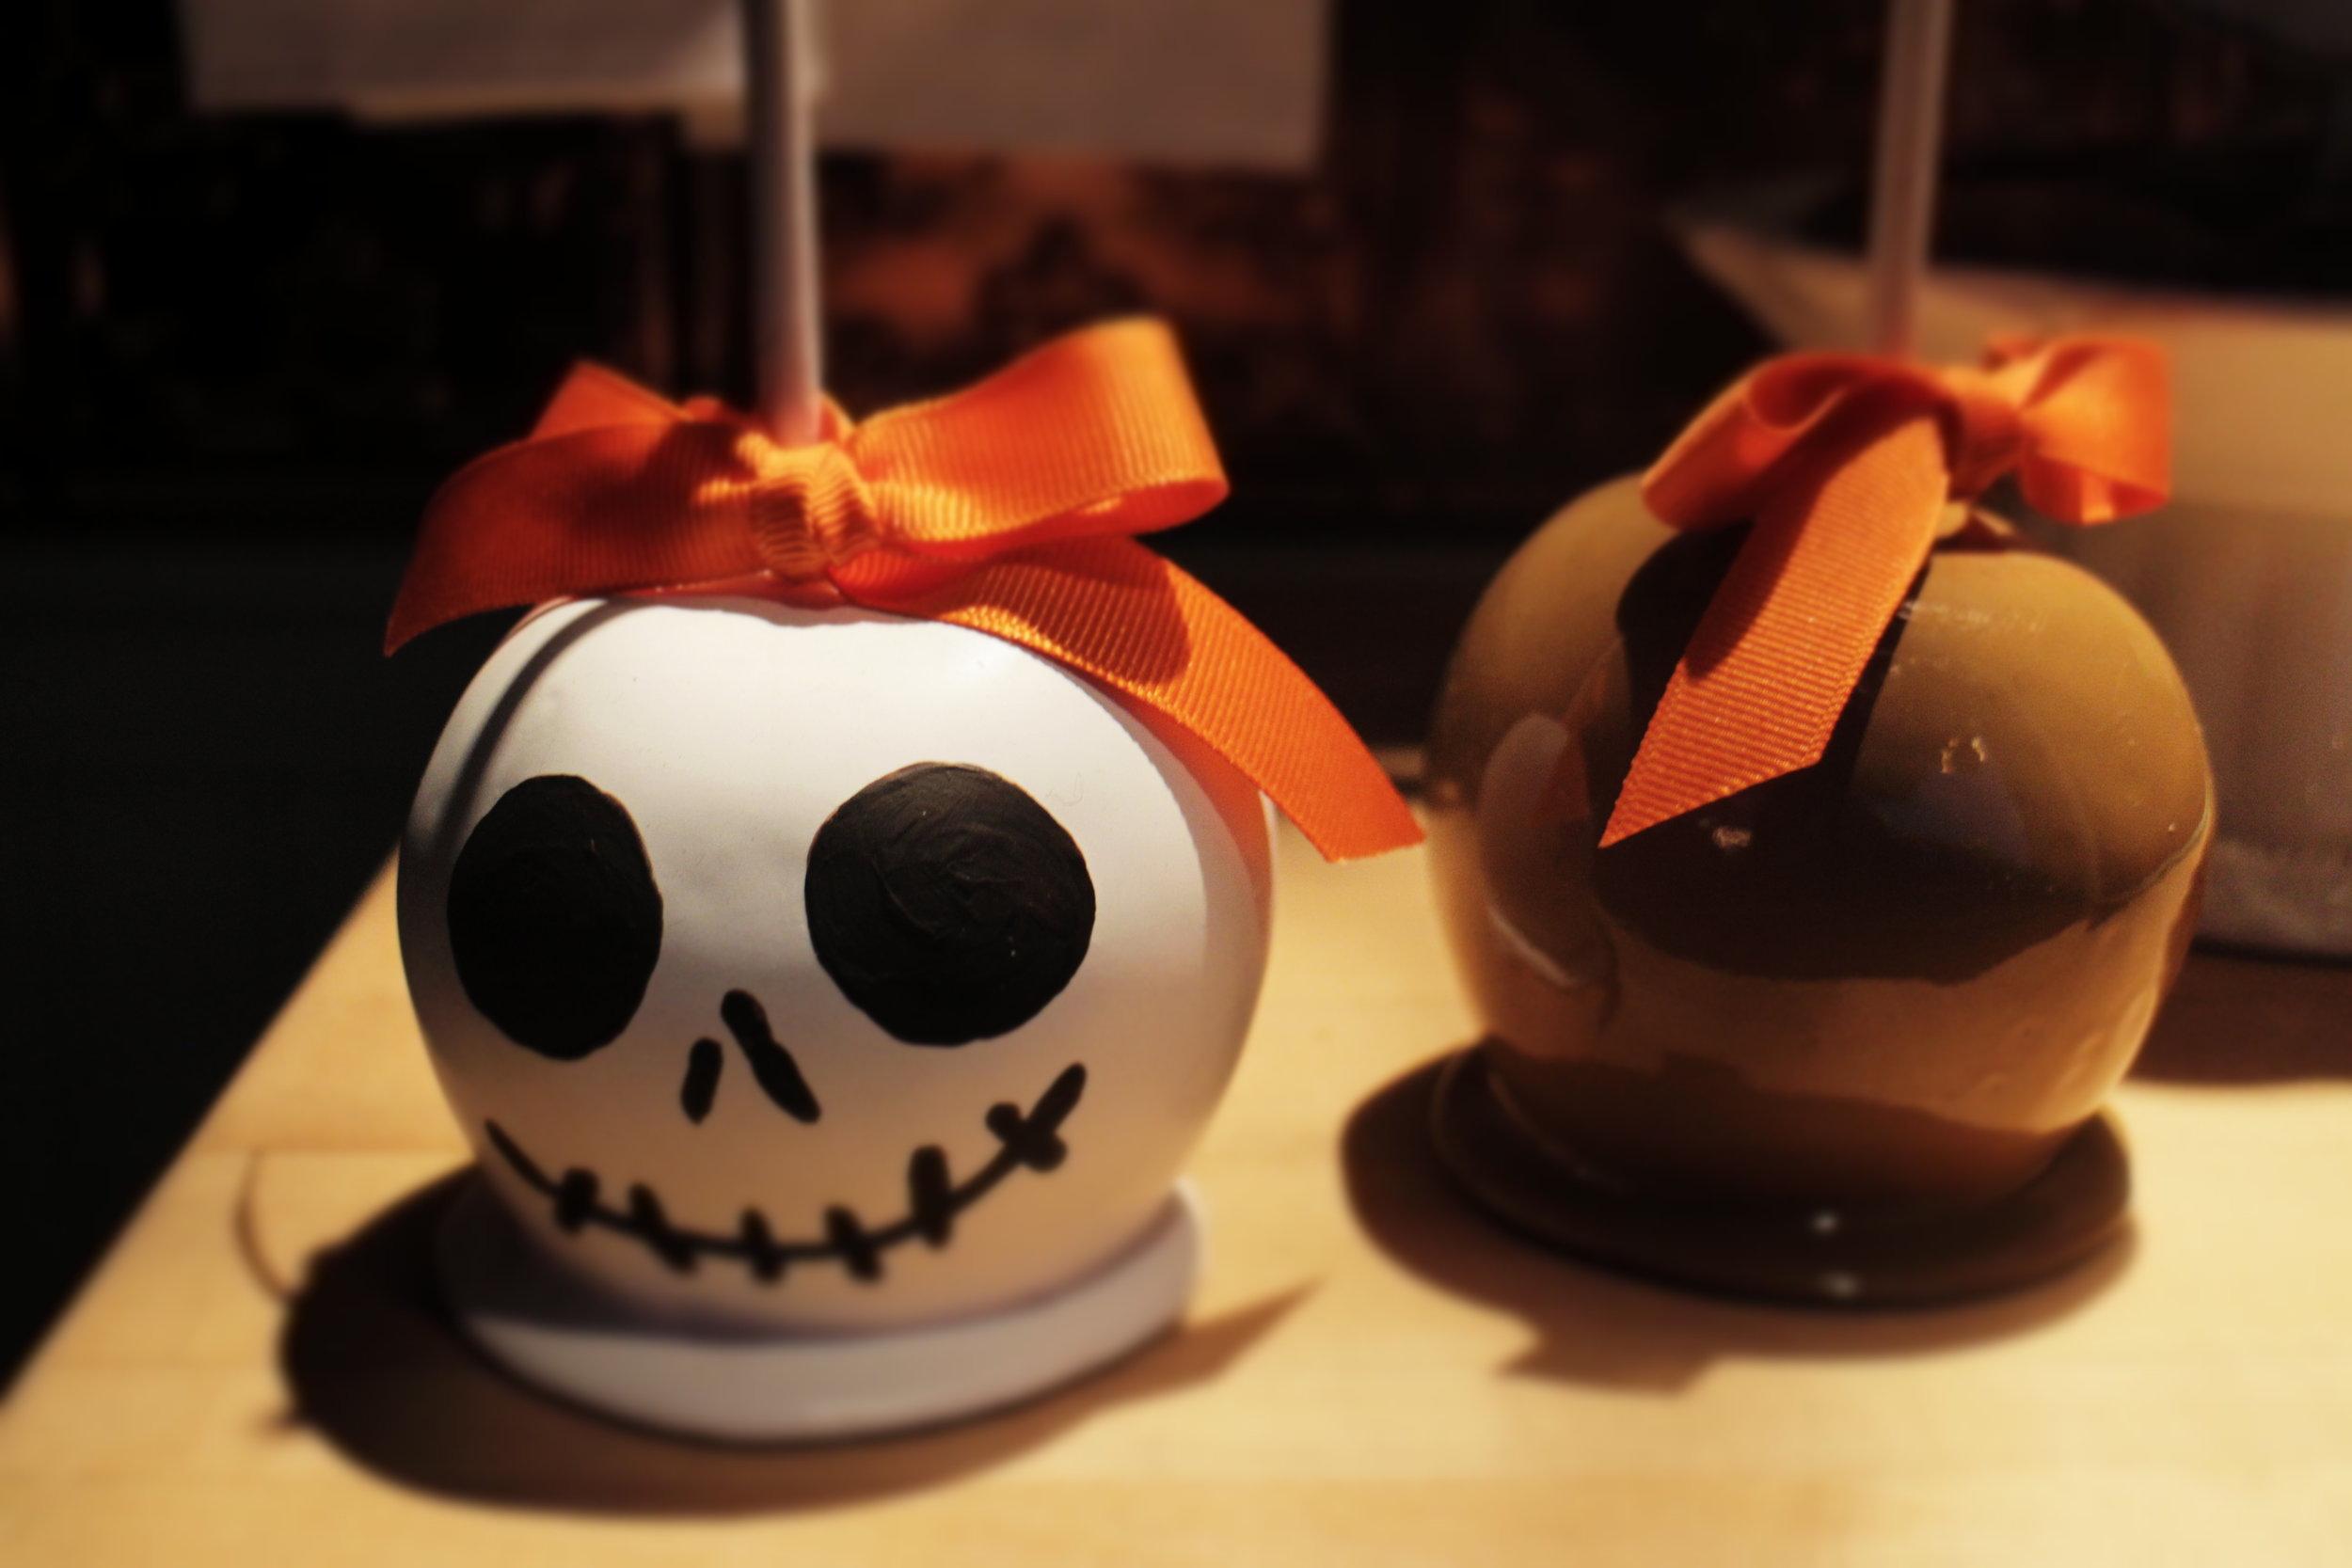 disneyland halloween time jack skellington candy apple